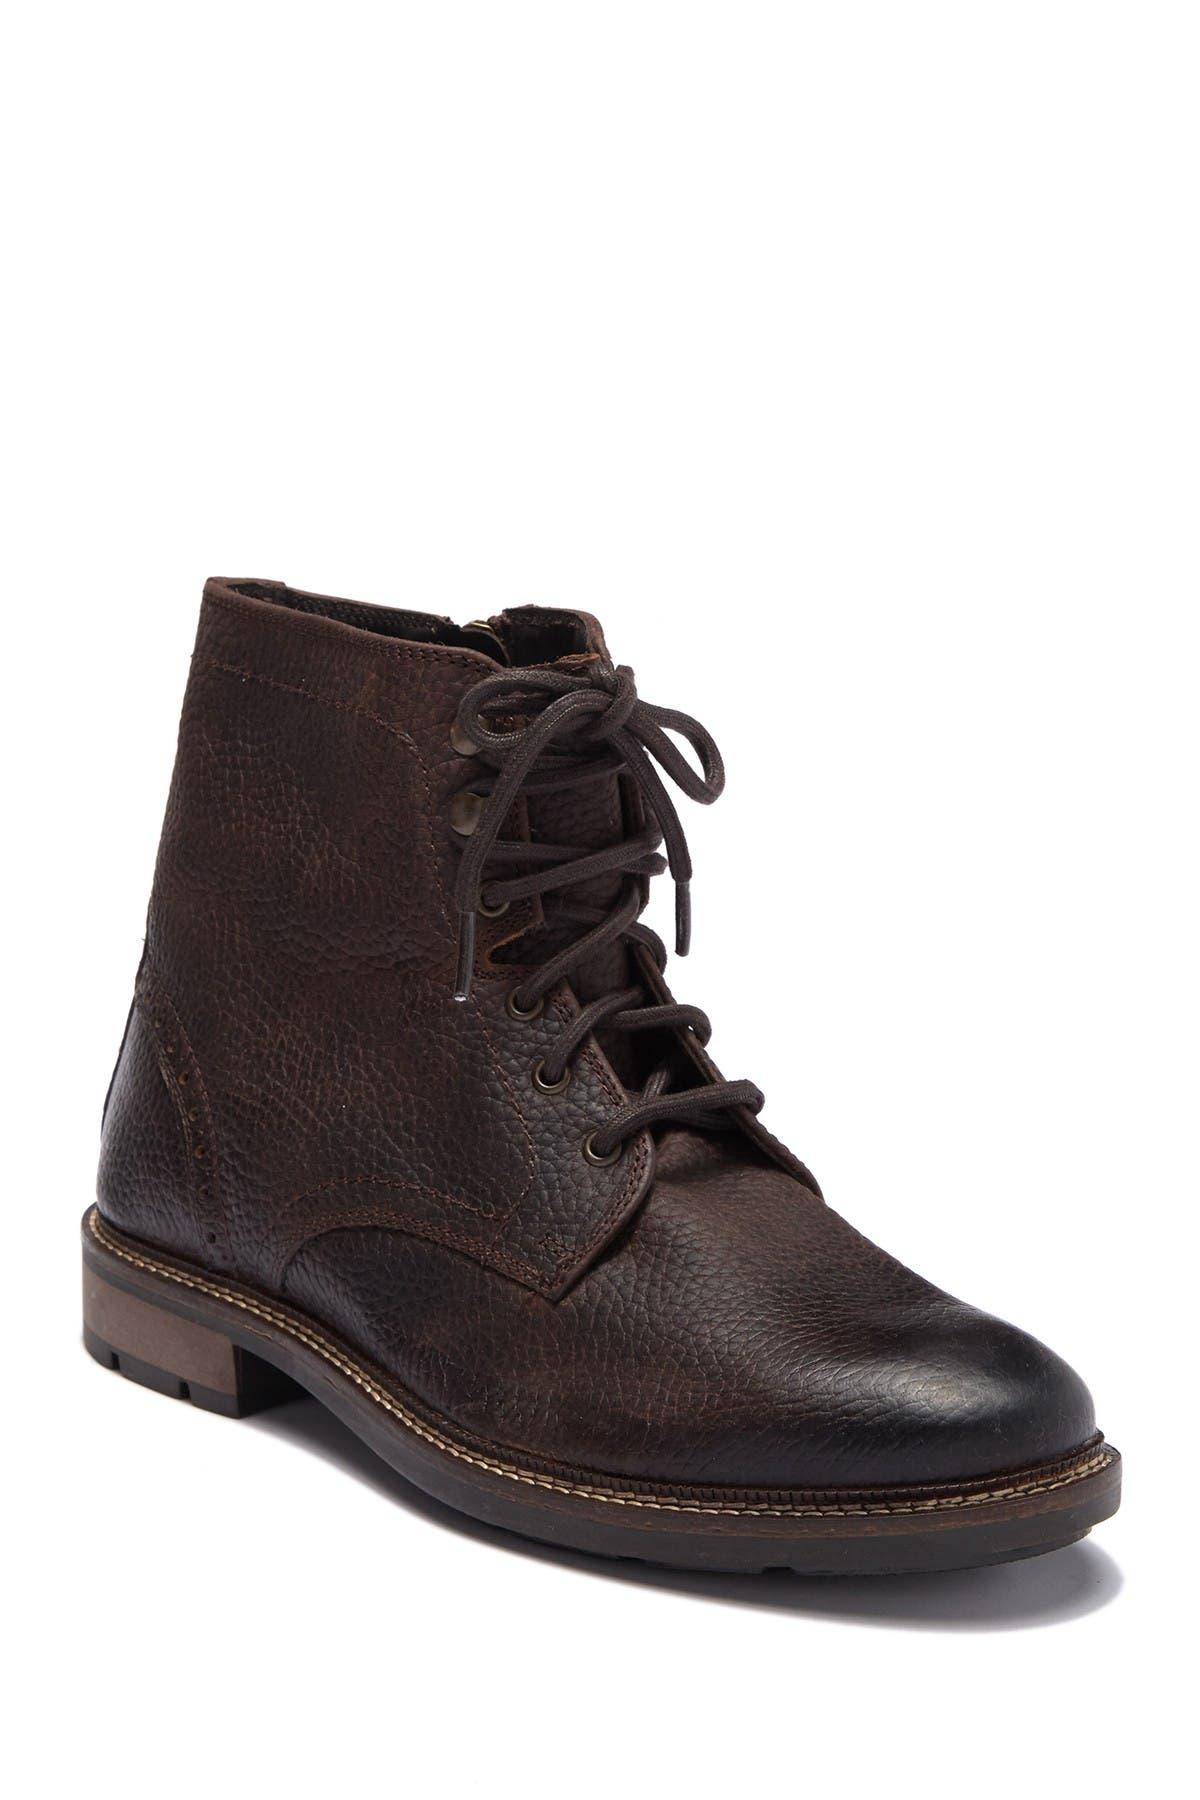 Image of Giorgio Brutini Neeno Textured Leather Lace-Up Boot